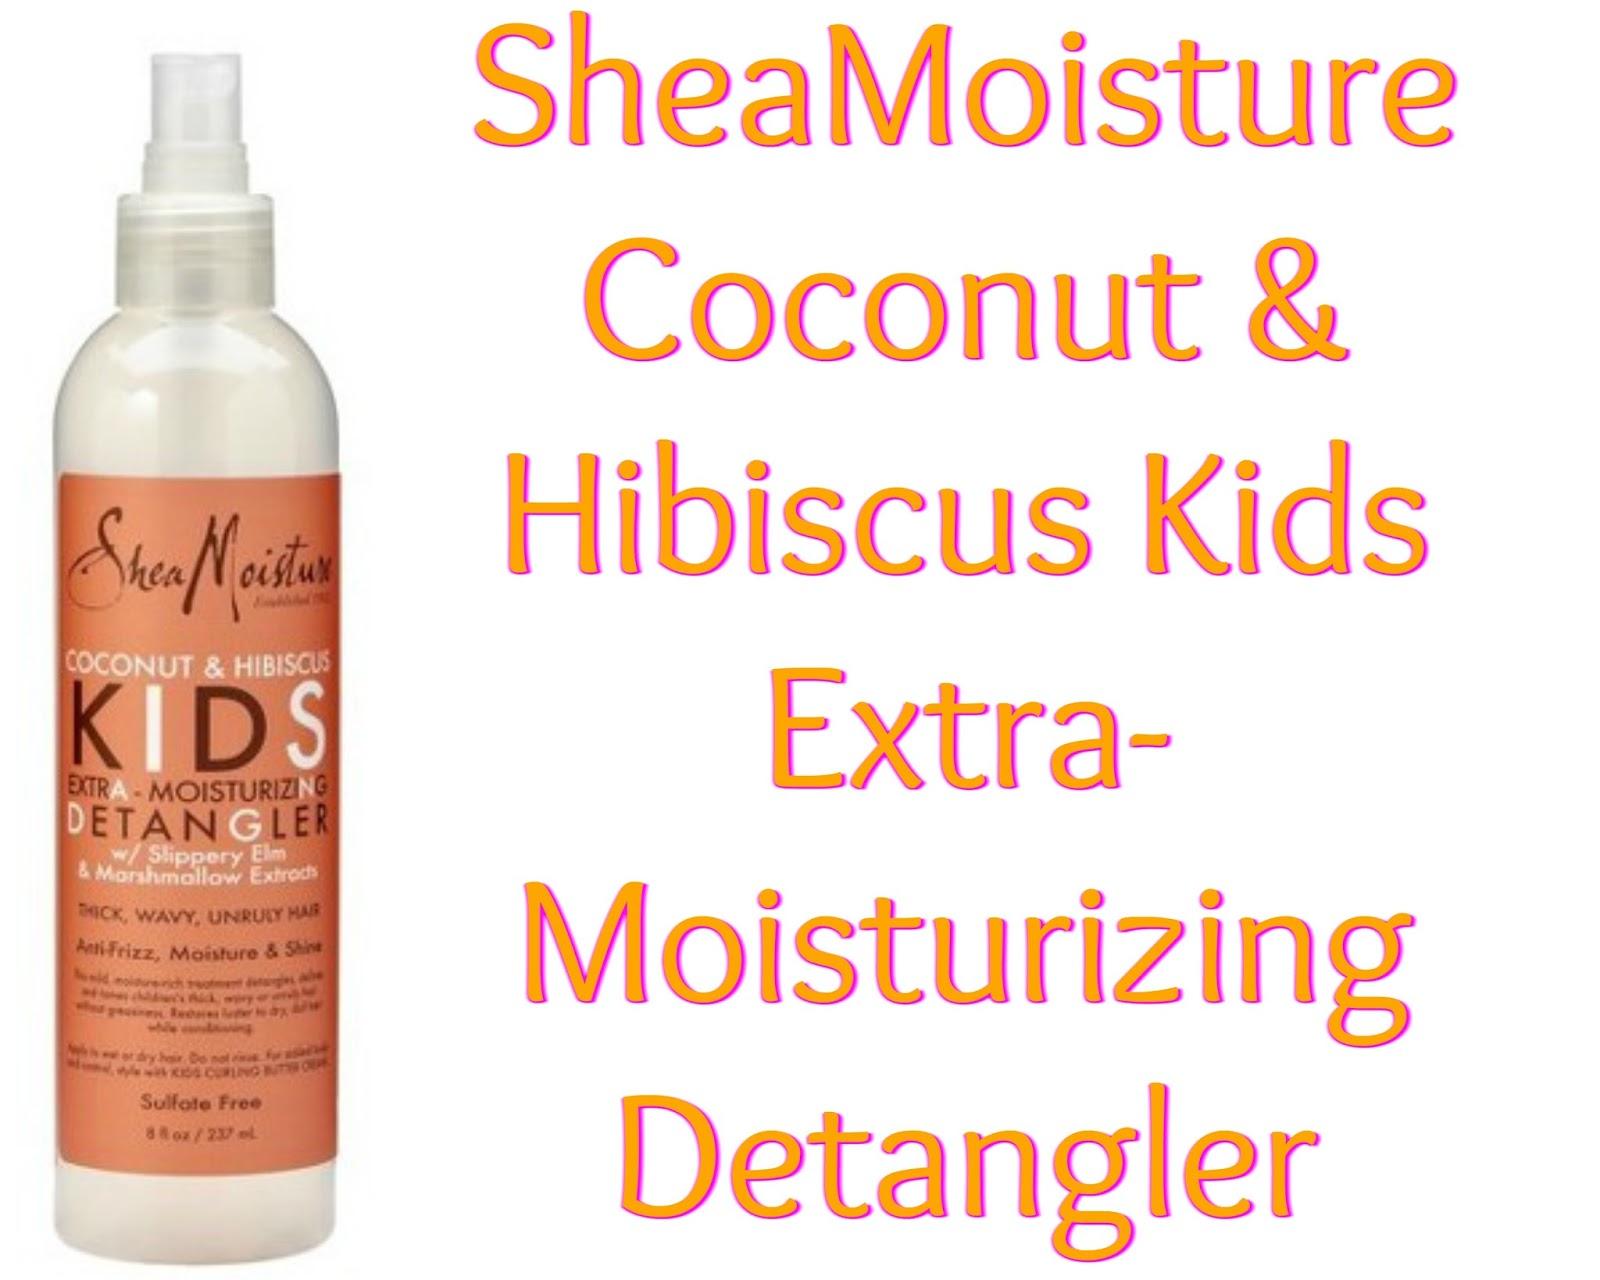 Click here to buy SheaMoisture® Coconut & Hibiscus Kids Extra-Moisturizing Detangler to tame those tangles.